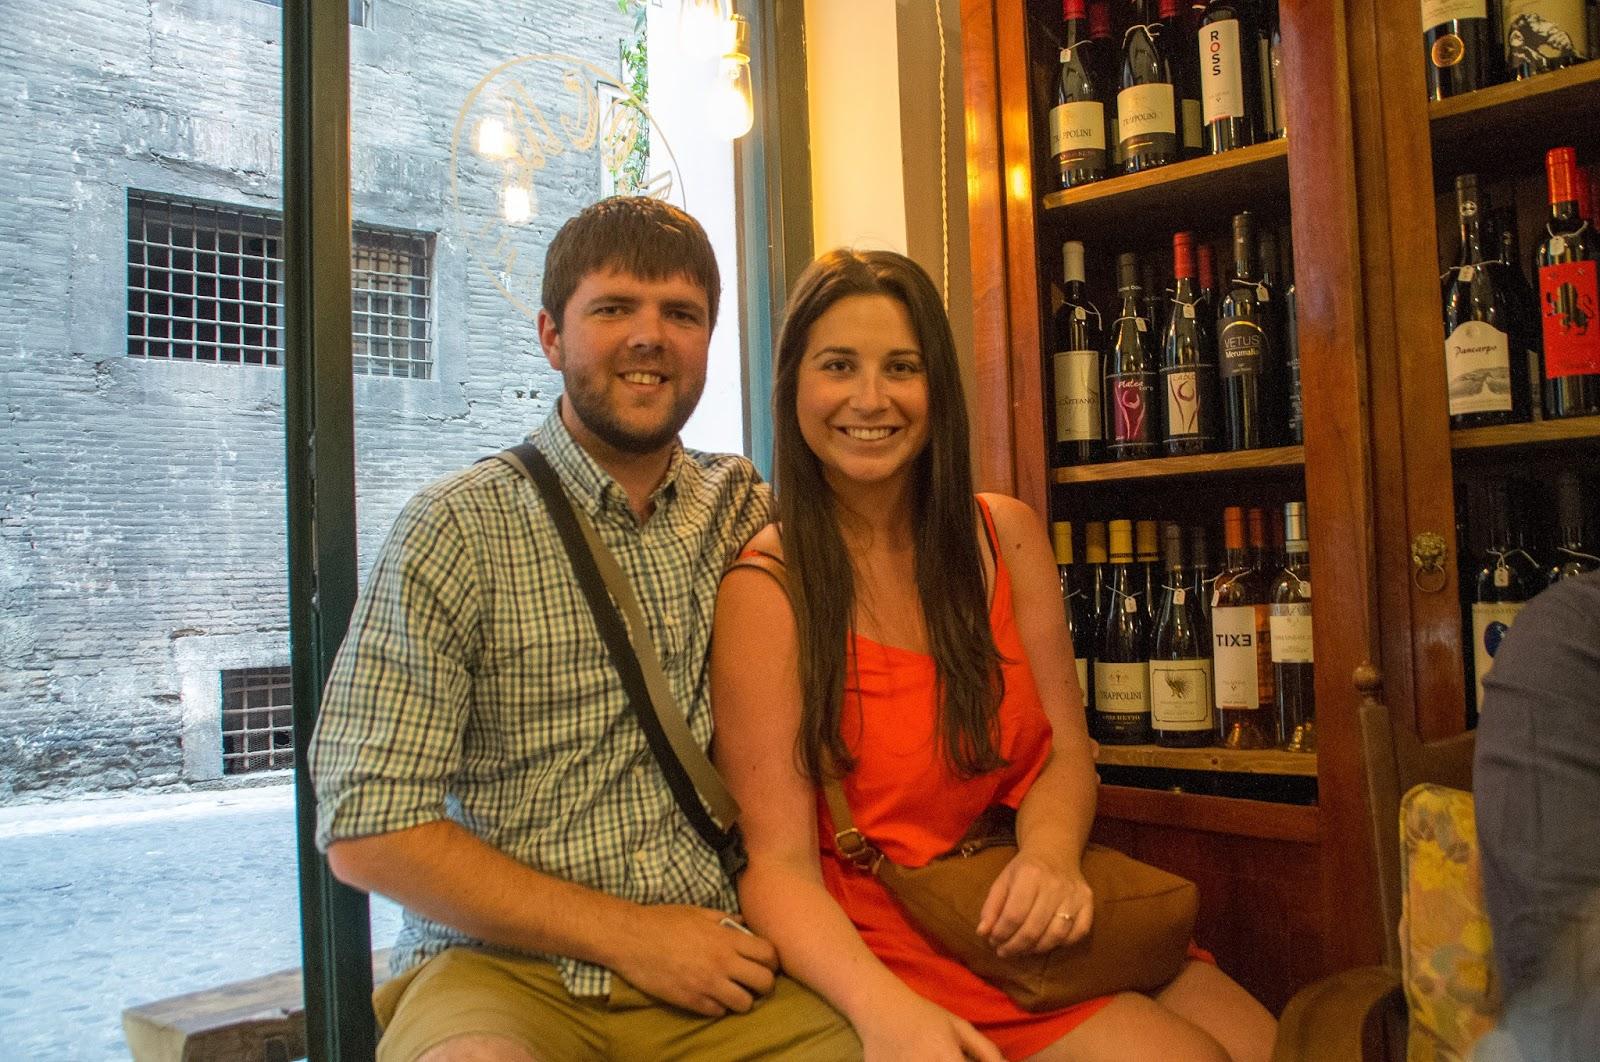 Simone and Dan on Secret Food Tour Rome